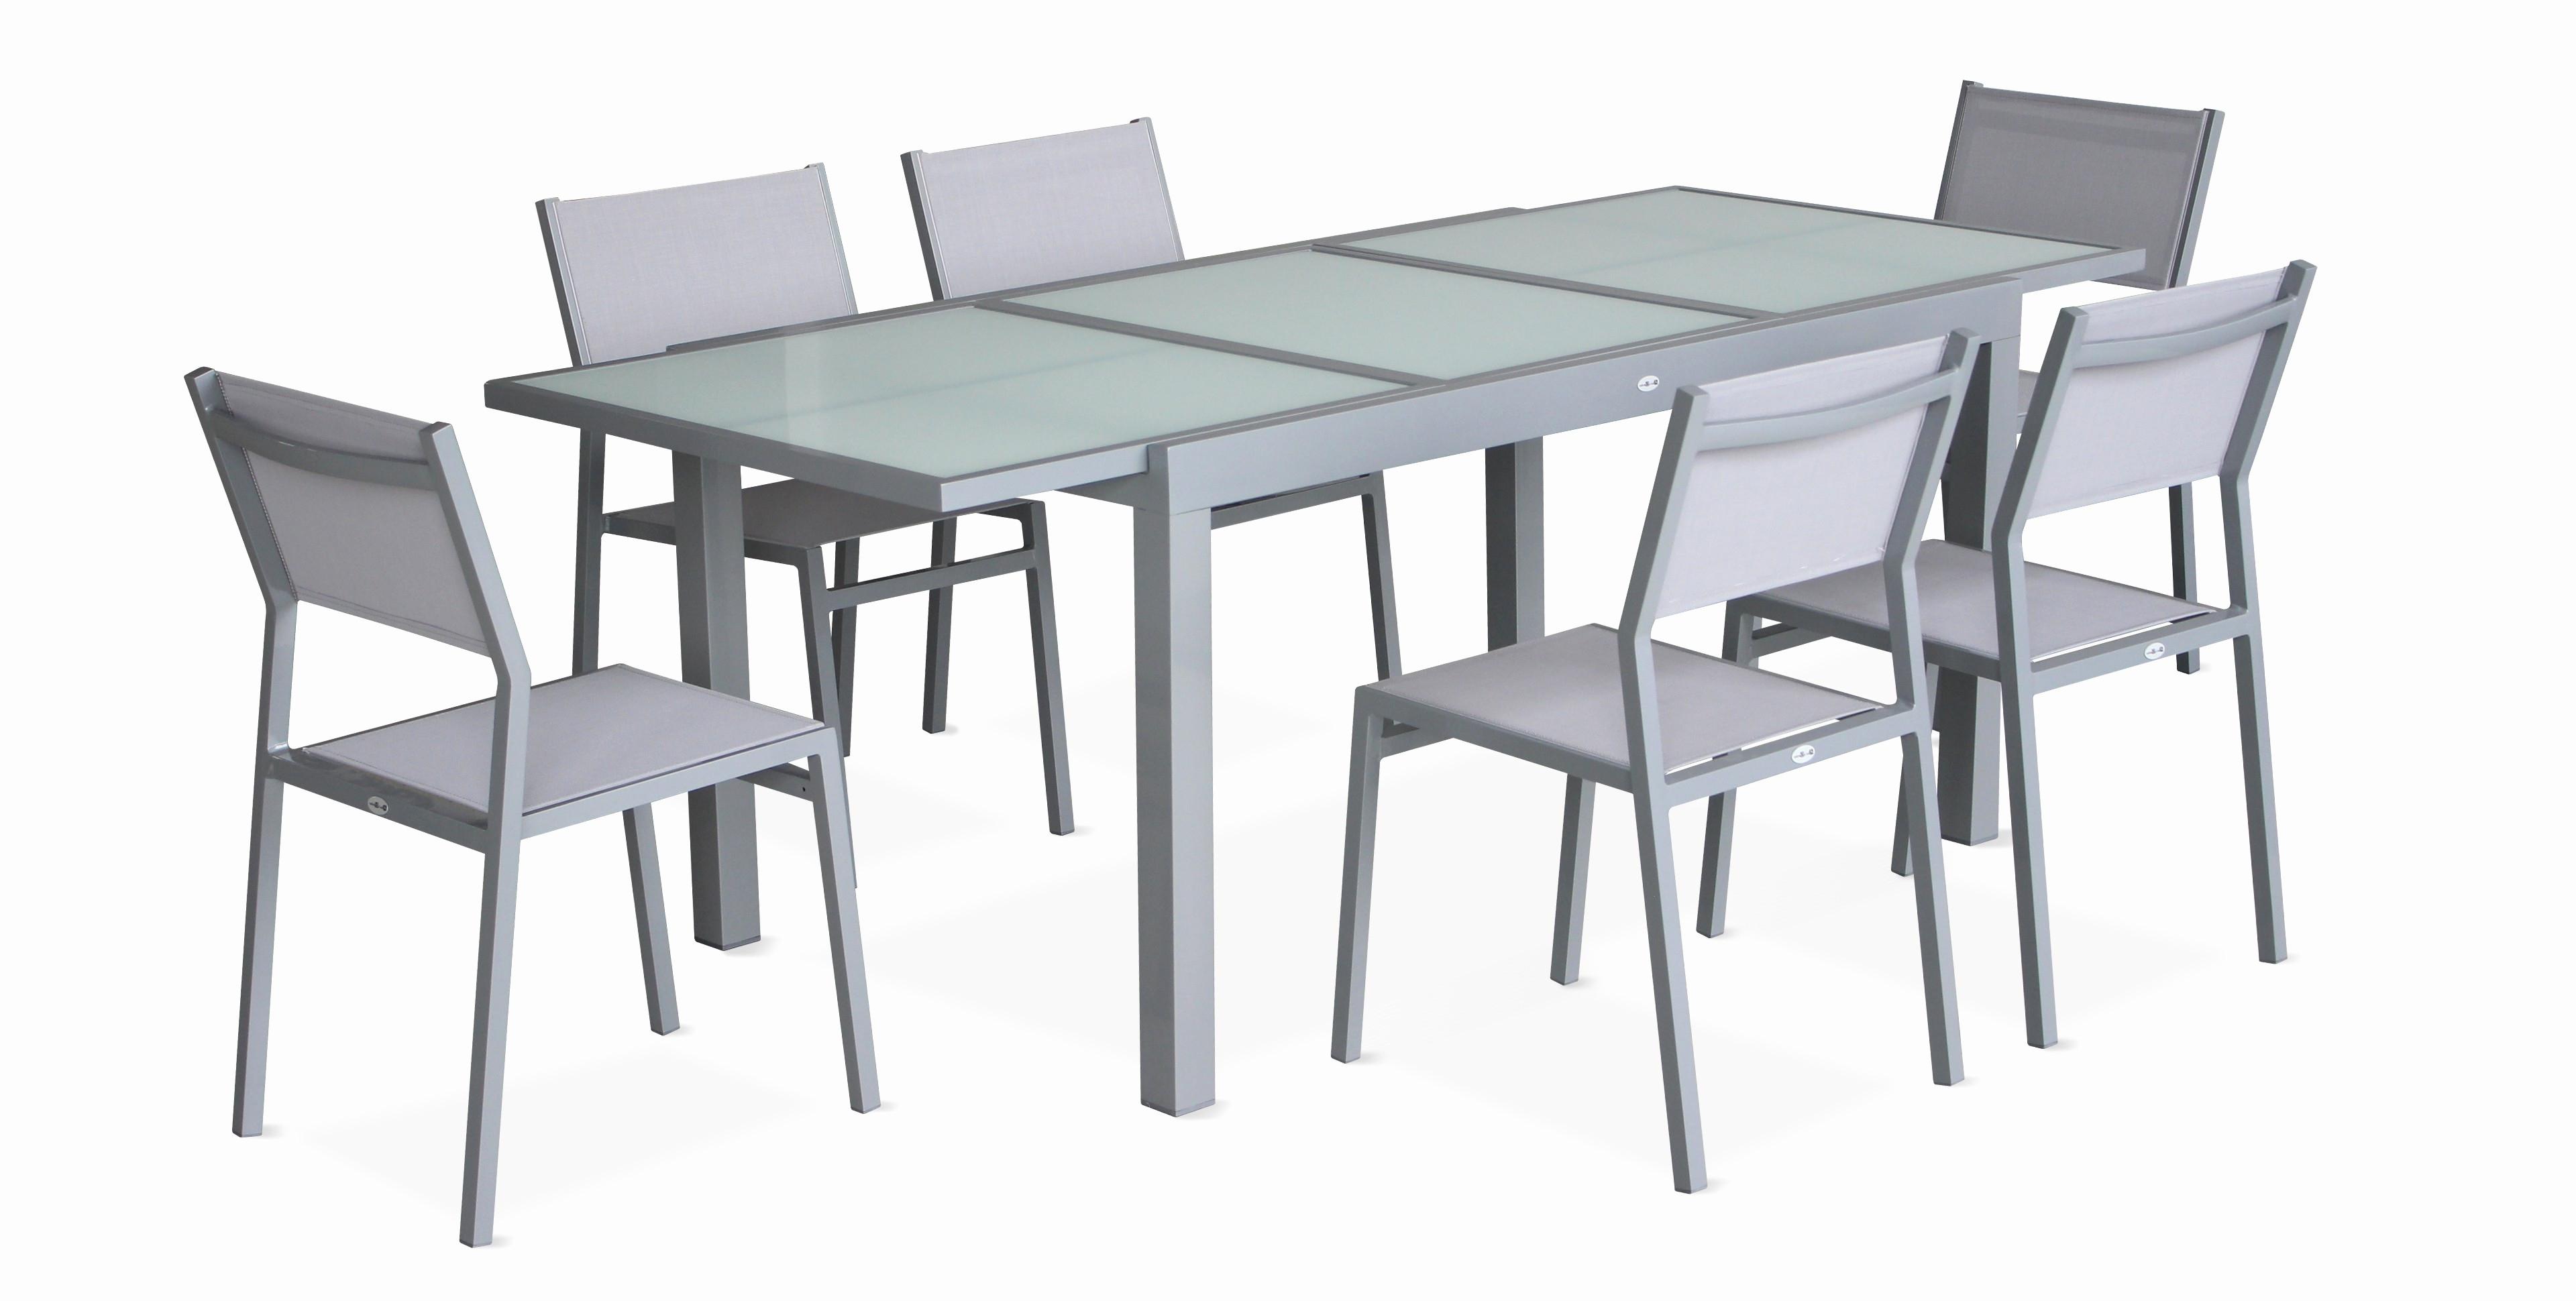 Abri De Jardin Gifi Meilleur De Collection Chaise De Jardin Gifi De Imposant Table Camping Gifi Good Table with